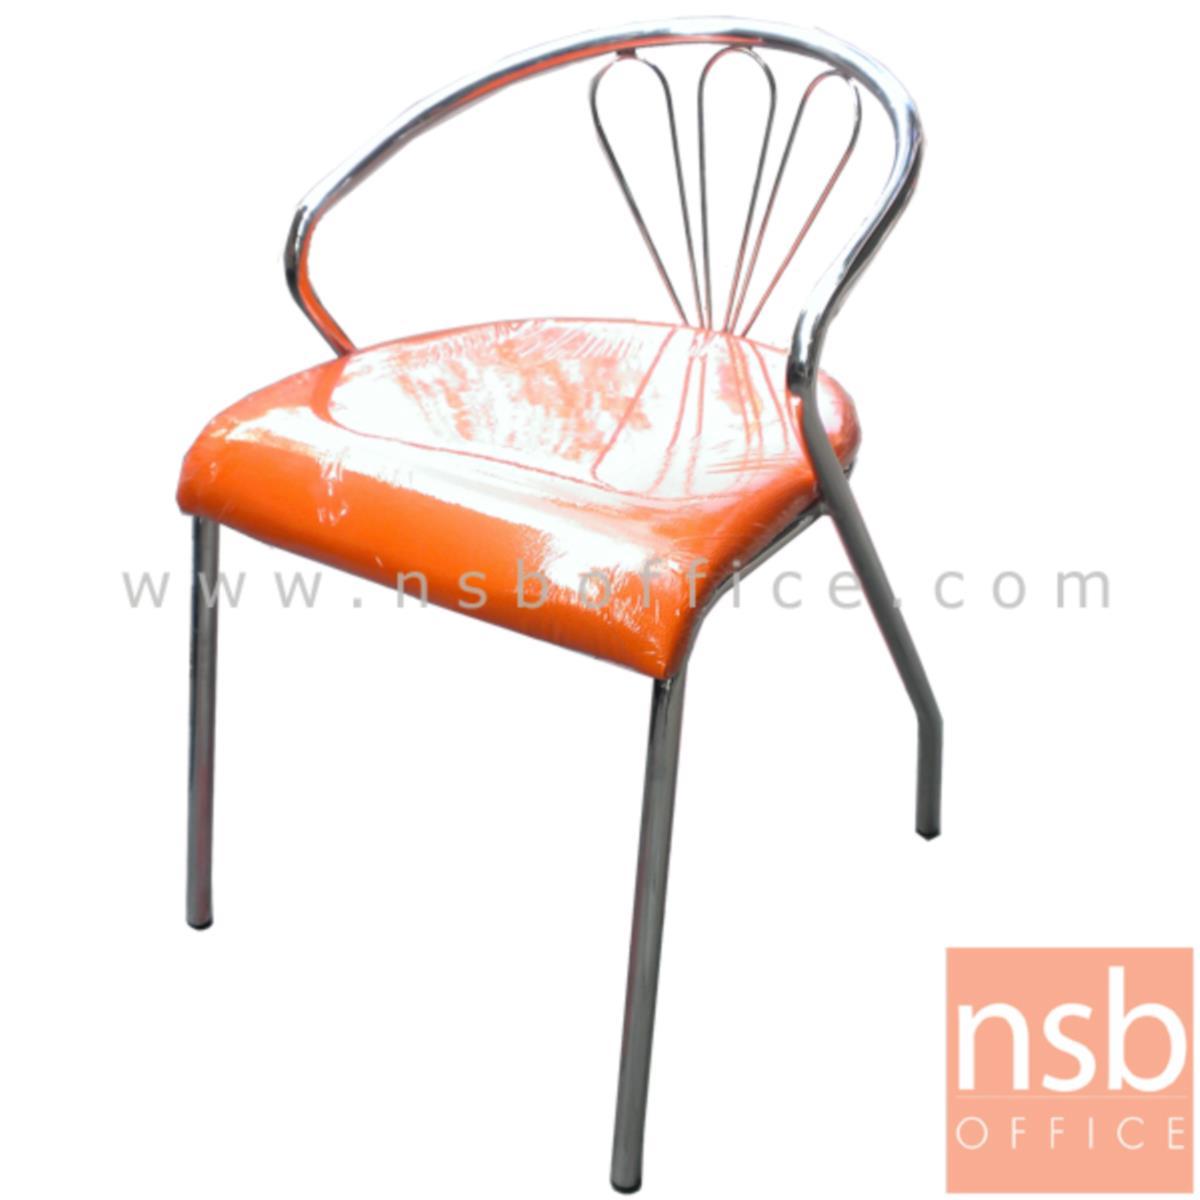 B08A005:เก้าอี้เอนกประสงค์เหล็ก รุ่น CM-005 ขาเหล็ก